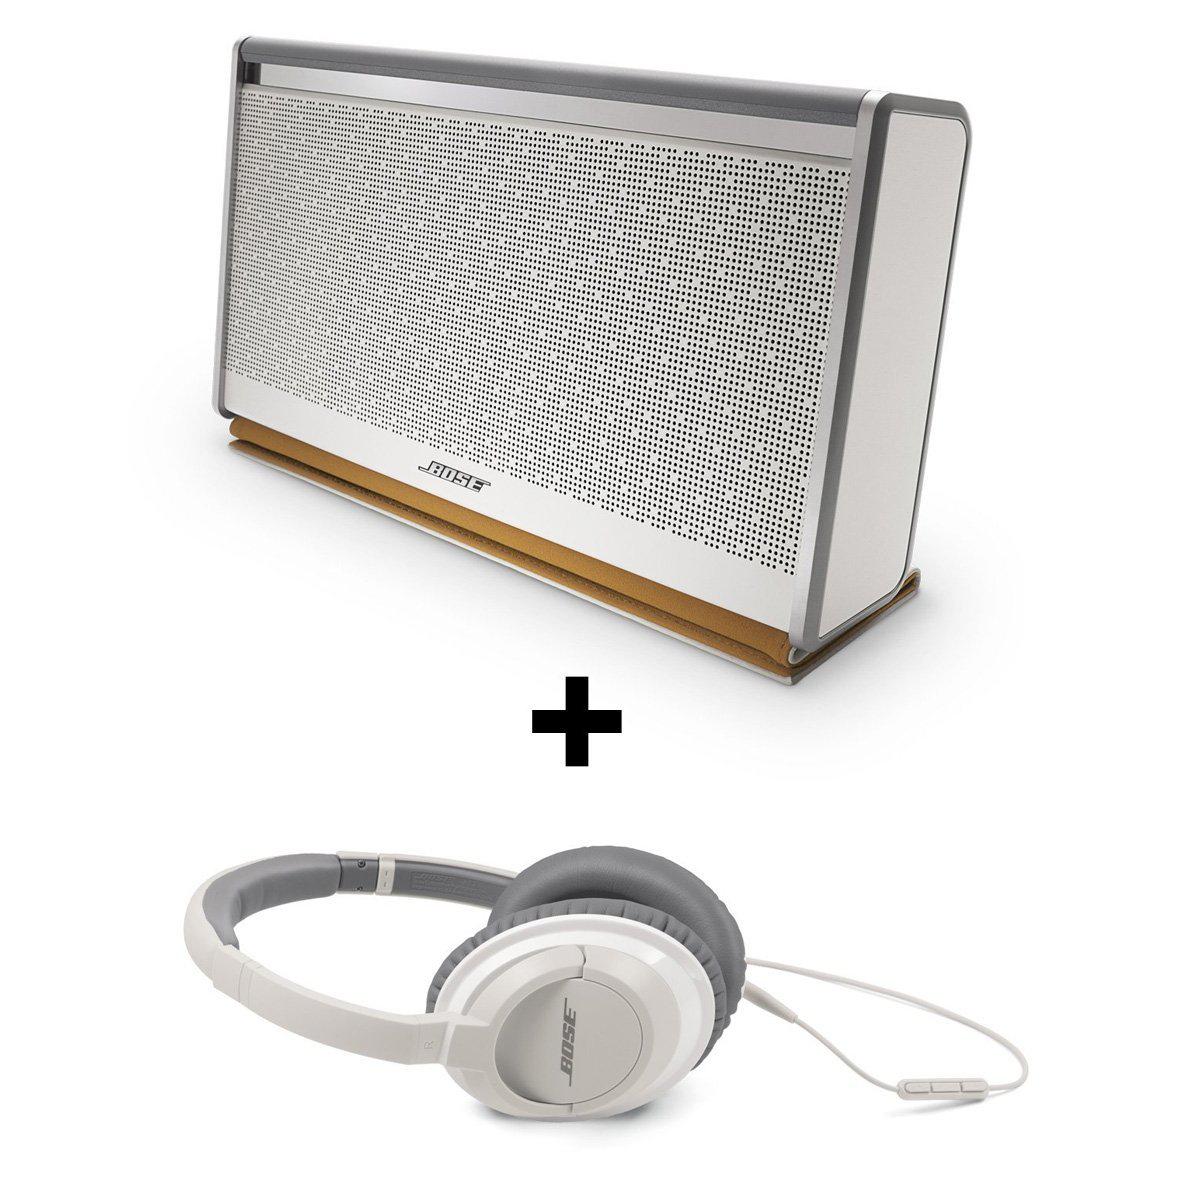 Pack Bose enceinte mobile Bluetooth SoundLink II et casque Bose AE2i